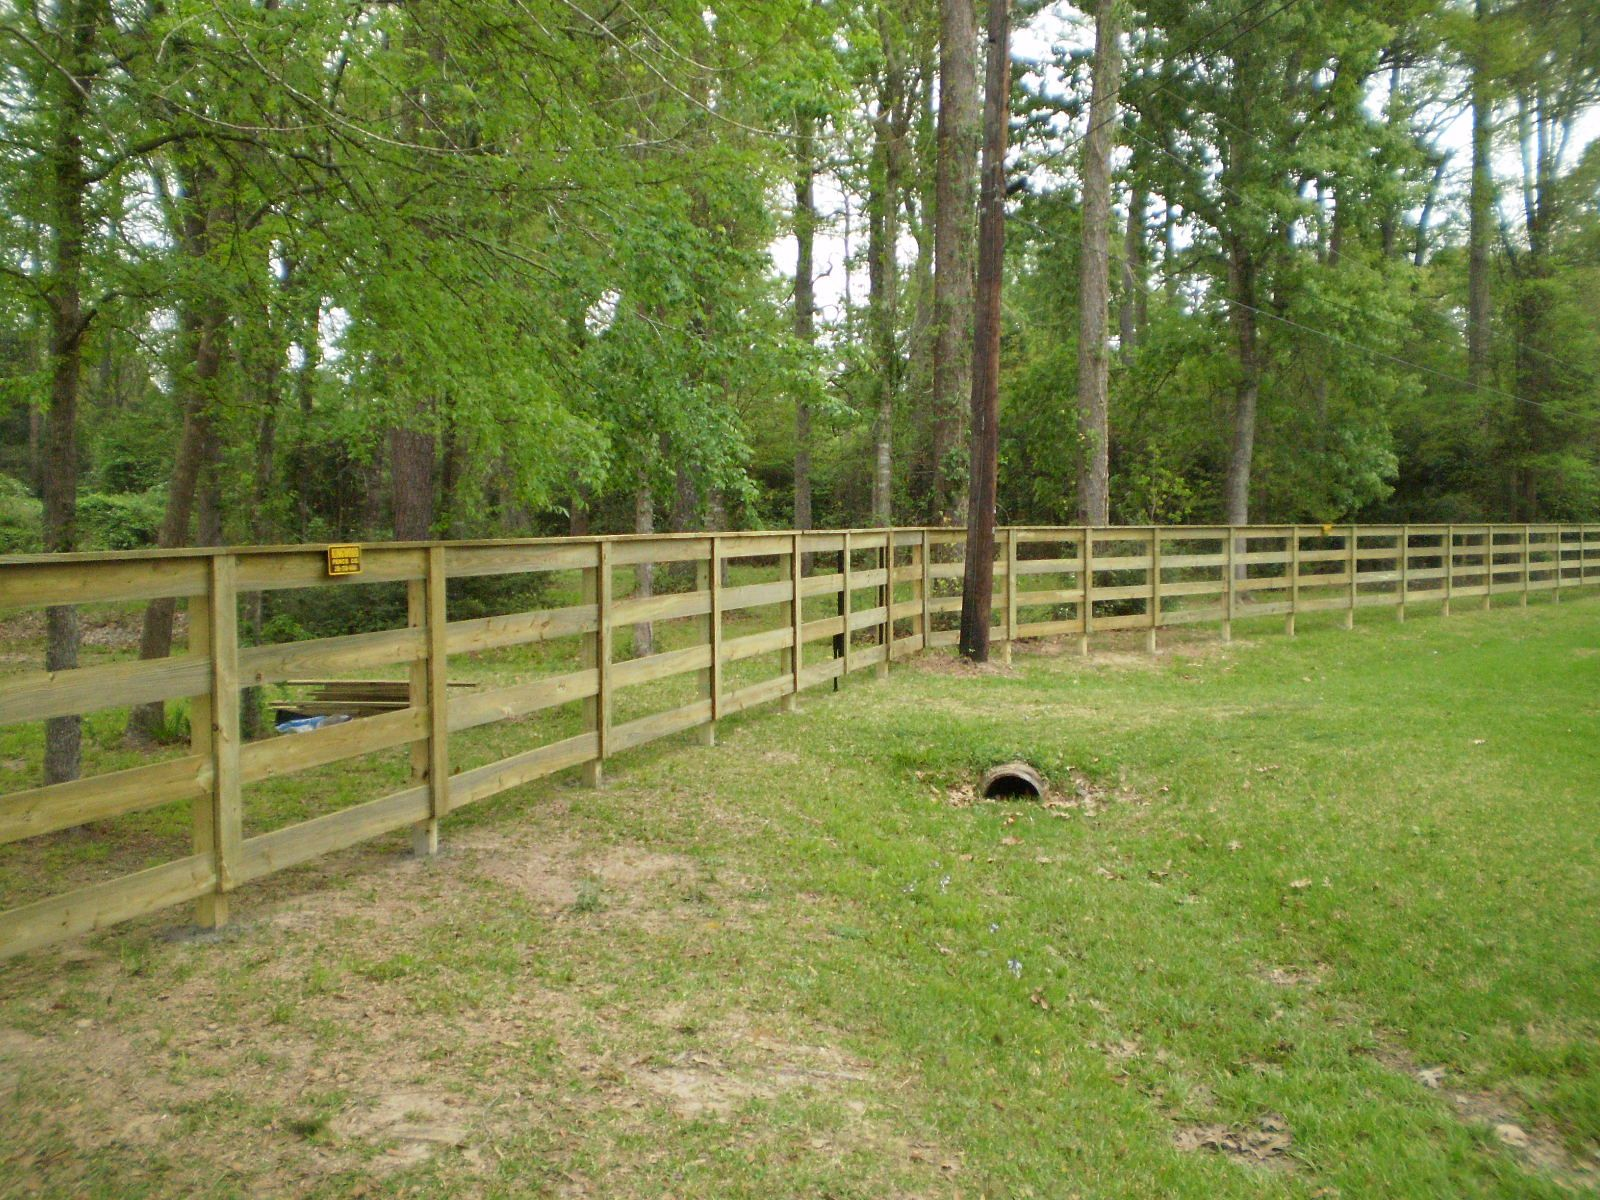 Wire fence four board fence google search landscaping wire fence four board fence google search baanklon Gallery